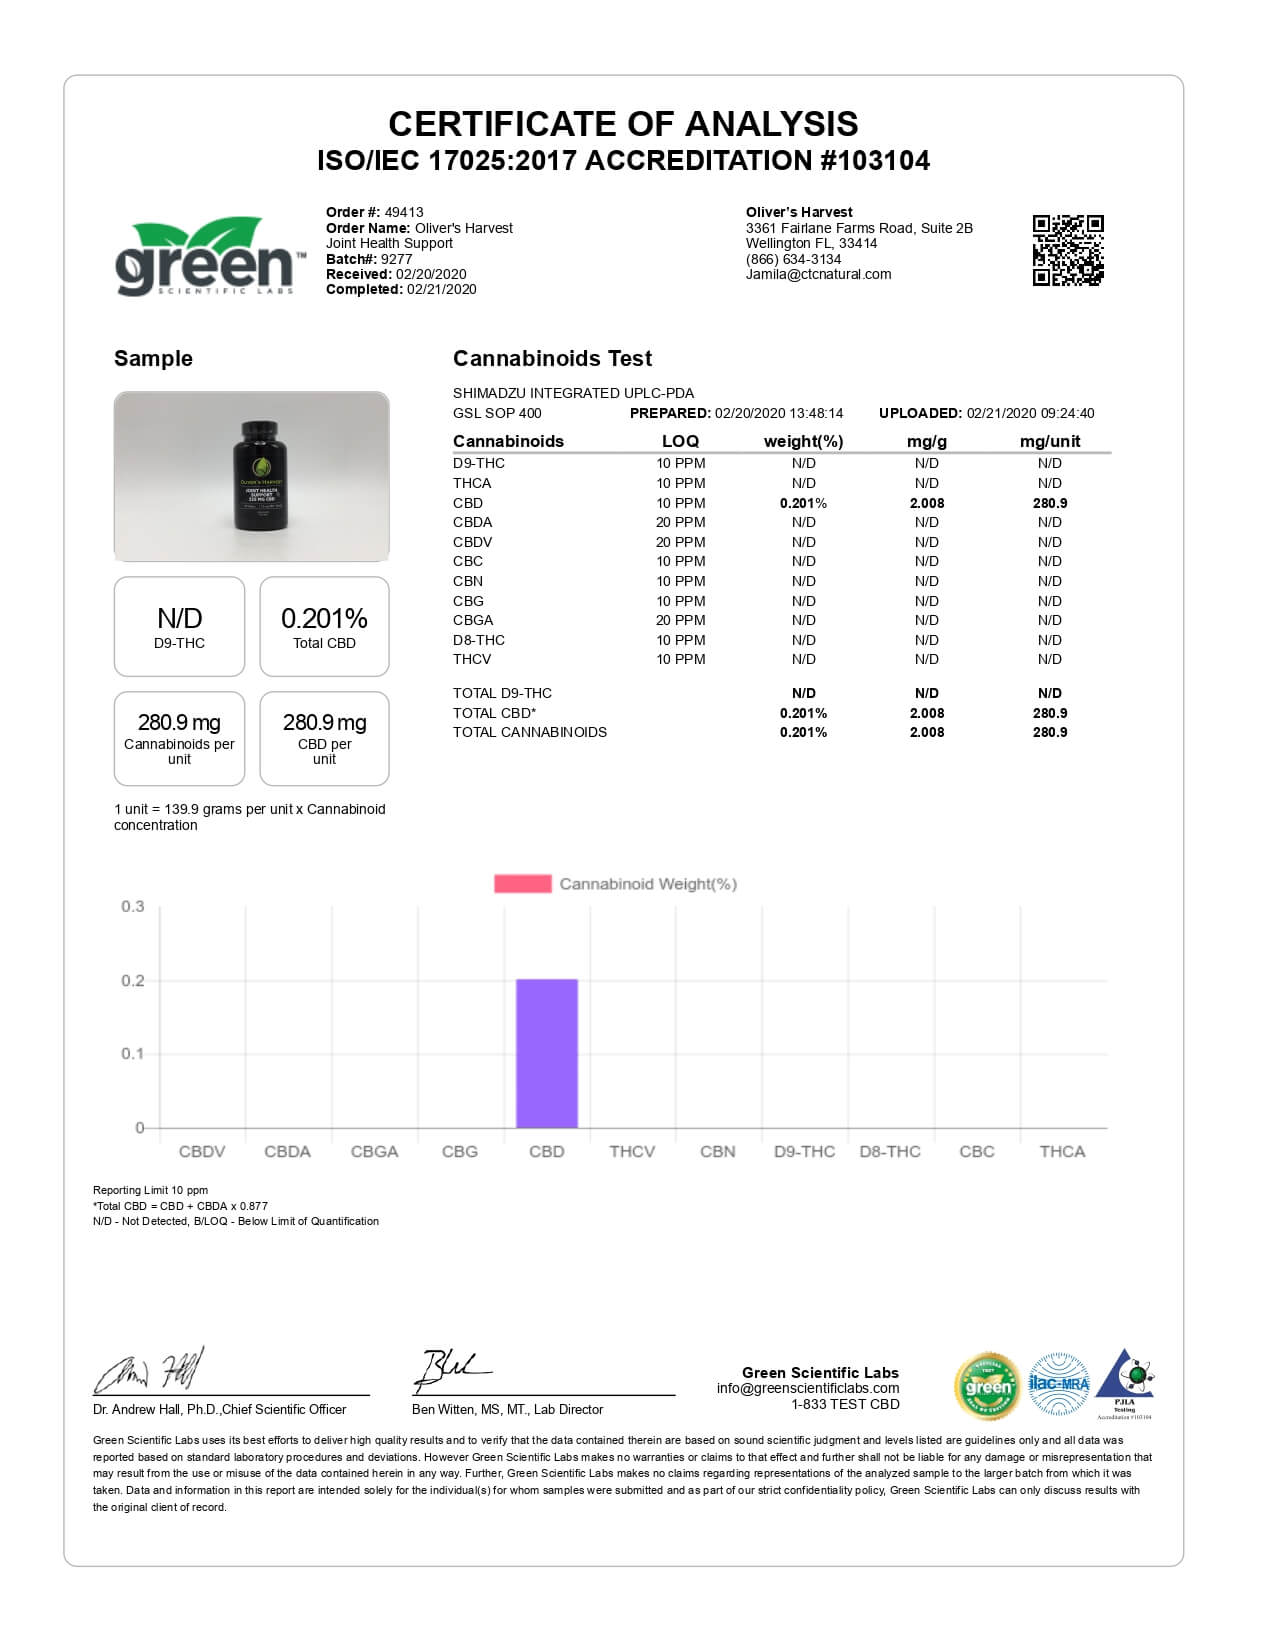 Oliver's Harvest CBD Capsule Joint Health Tablets Lab Report